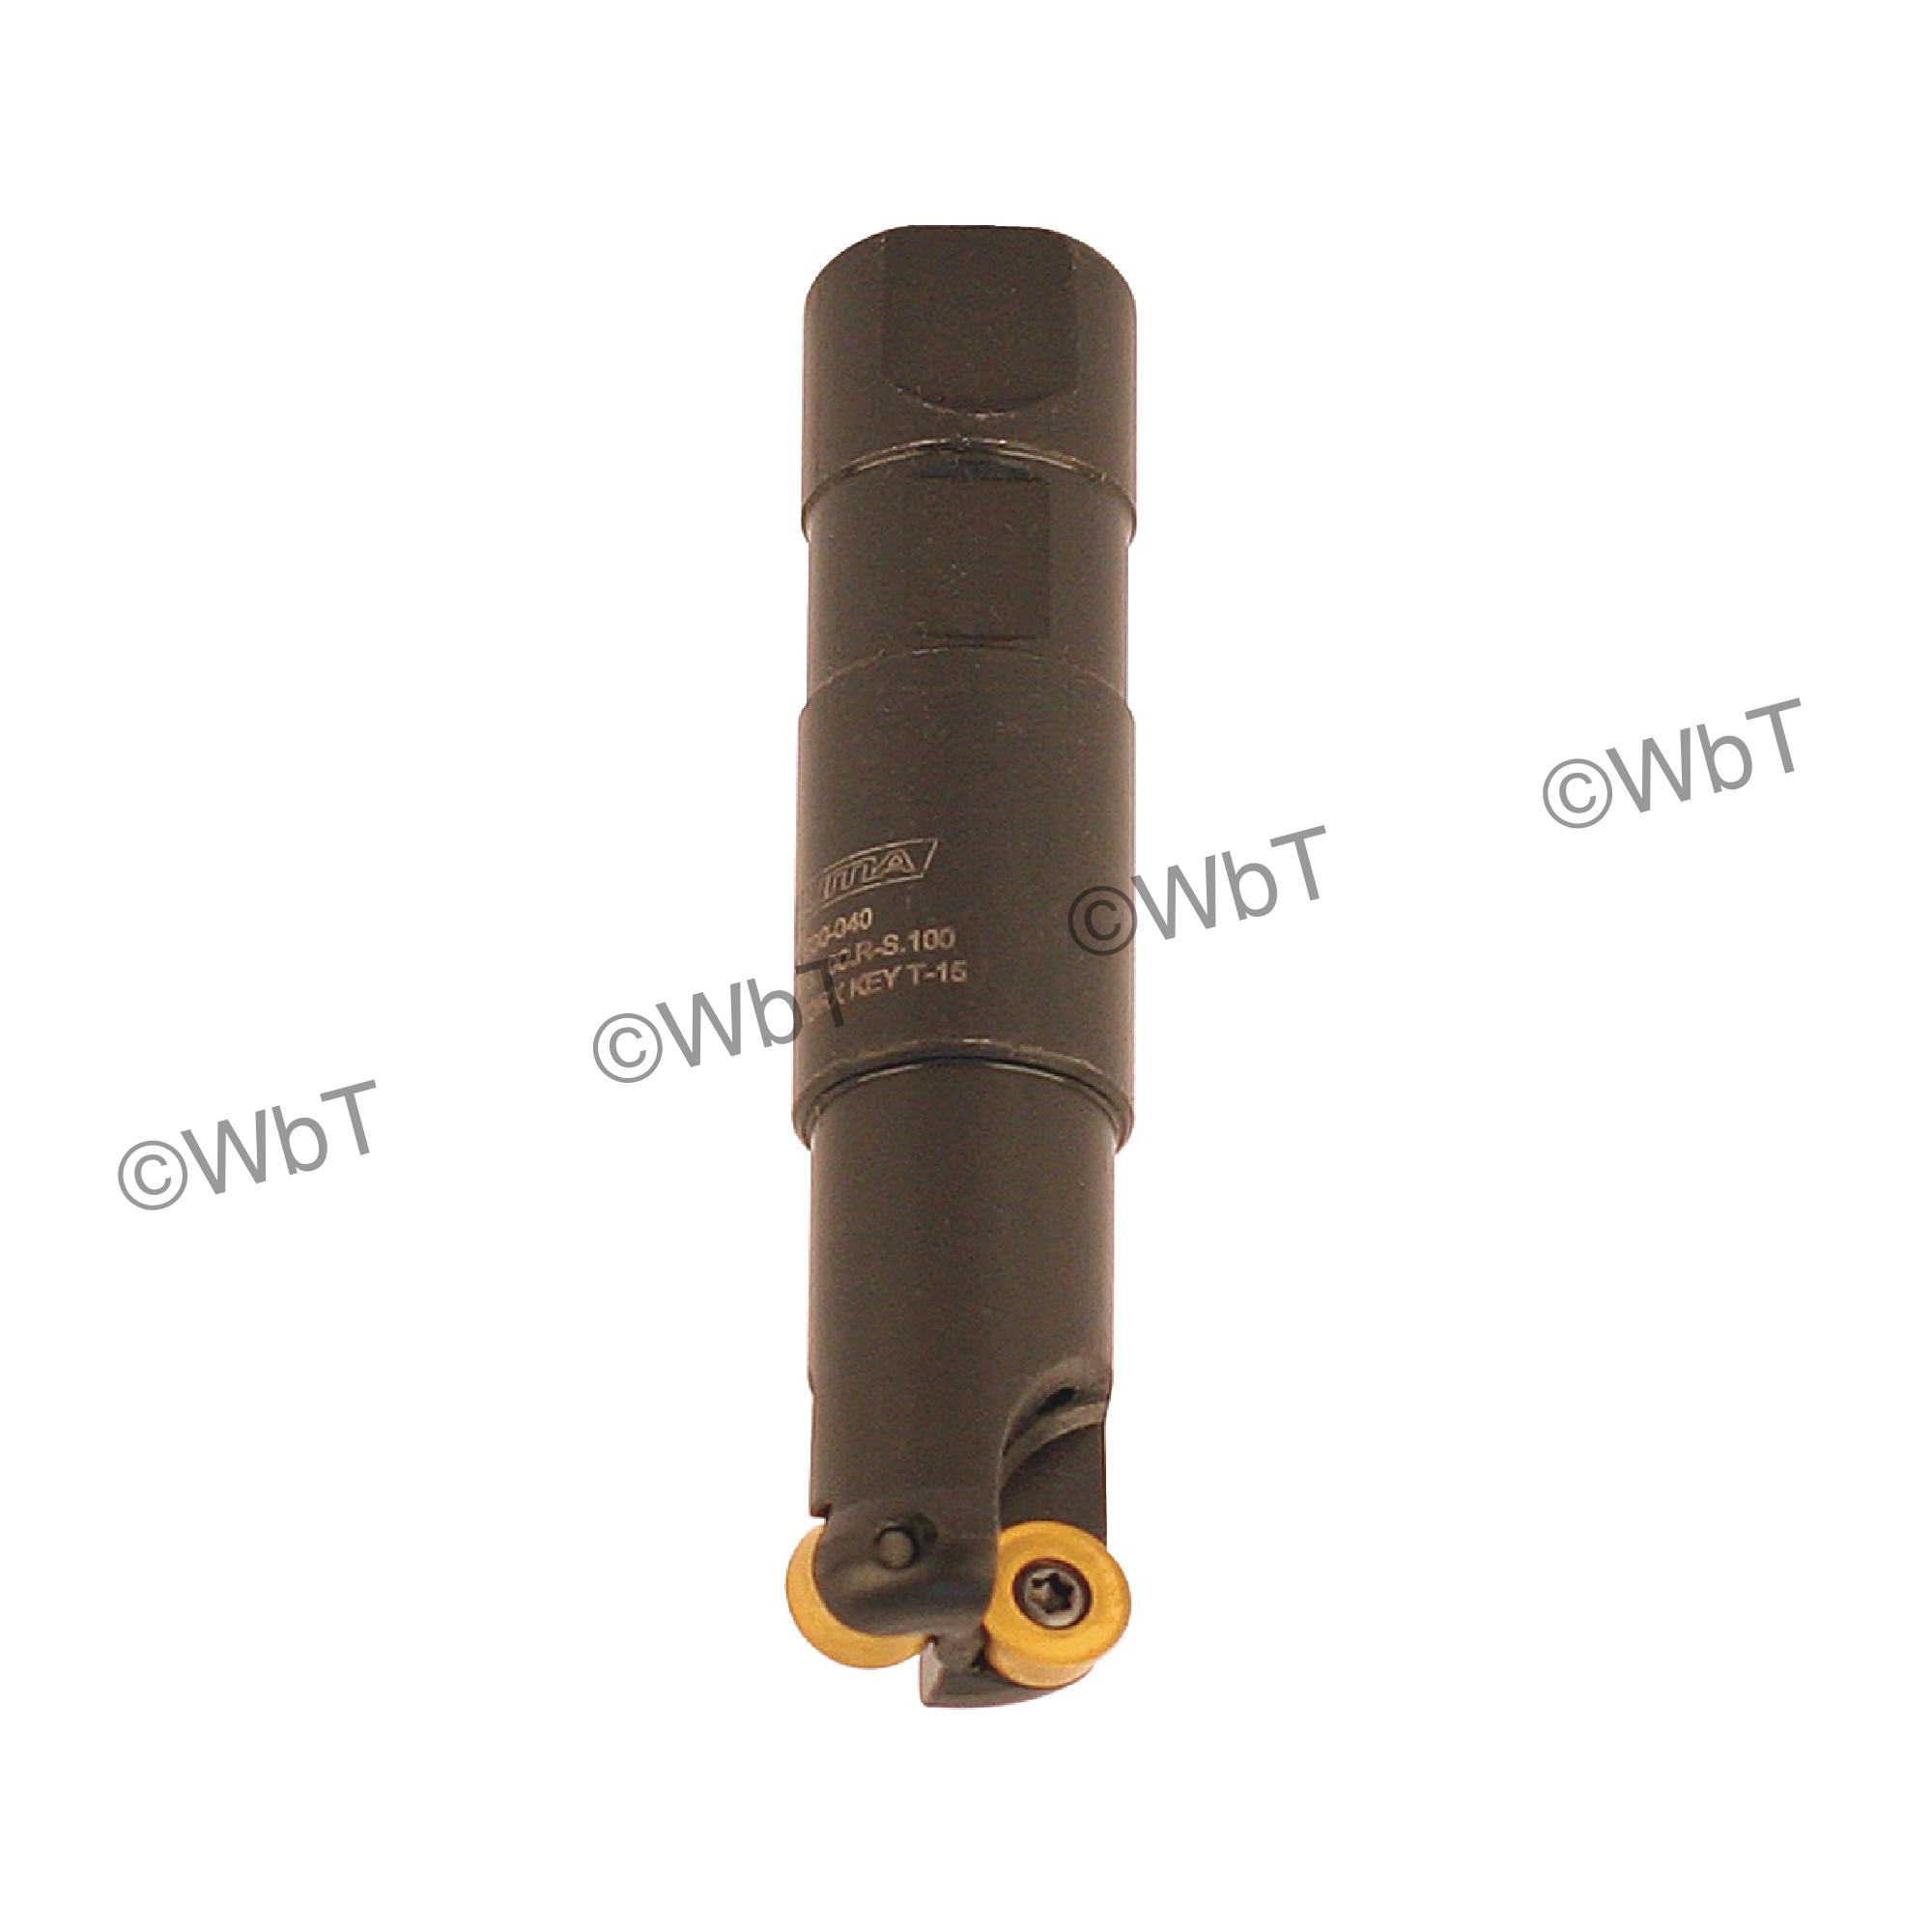 "AKUMA - 1.000"" Endmill Set / Includes: (1) RPS.43.100.R-S.100 (1.0""ø) & (10) RPMT1204M0S-M1 CM30P Coated Inserts"